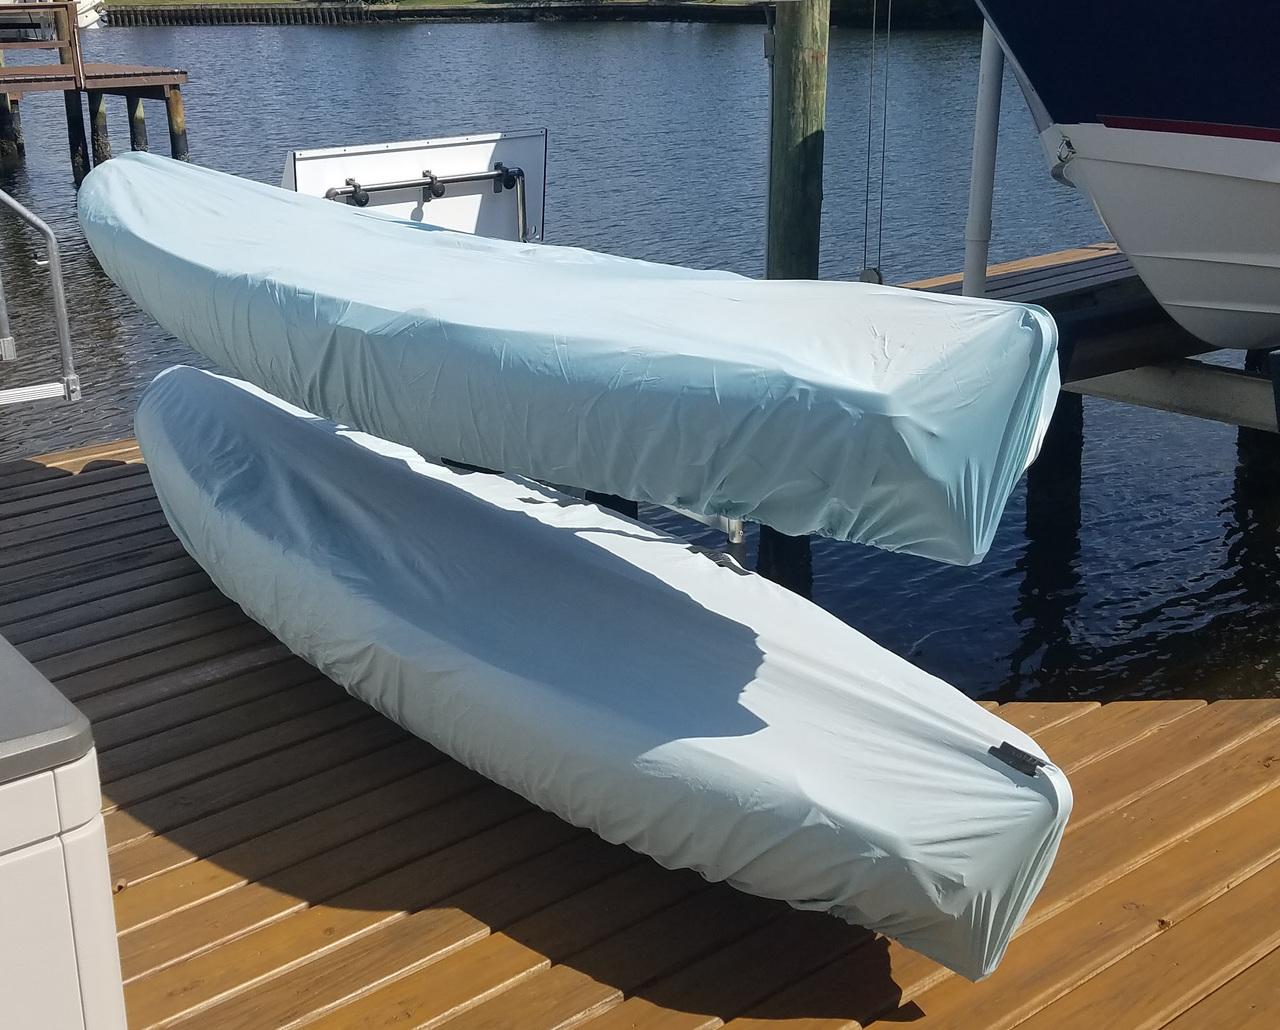 Stainless Steel 2 Kayak Storage | Outdoor Dock Freestanding Rack